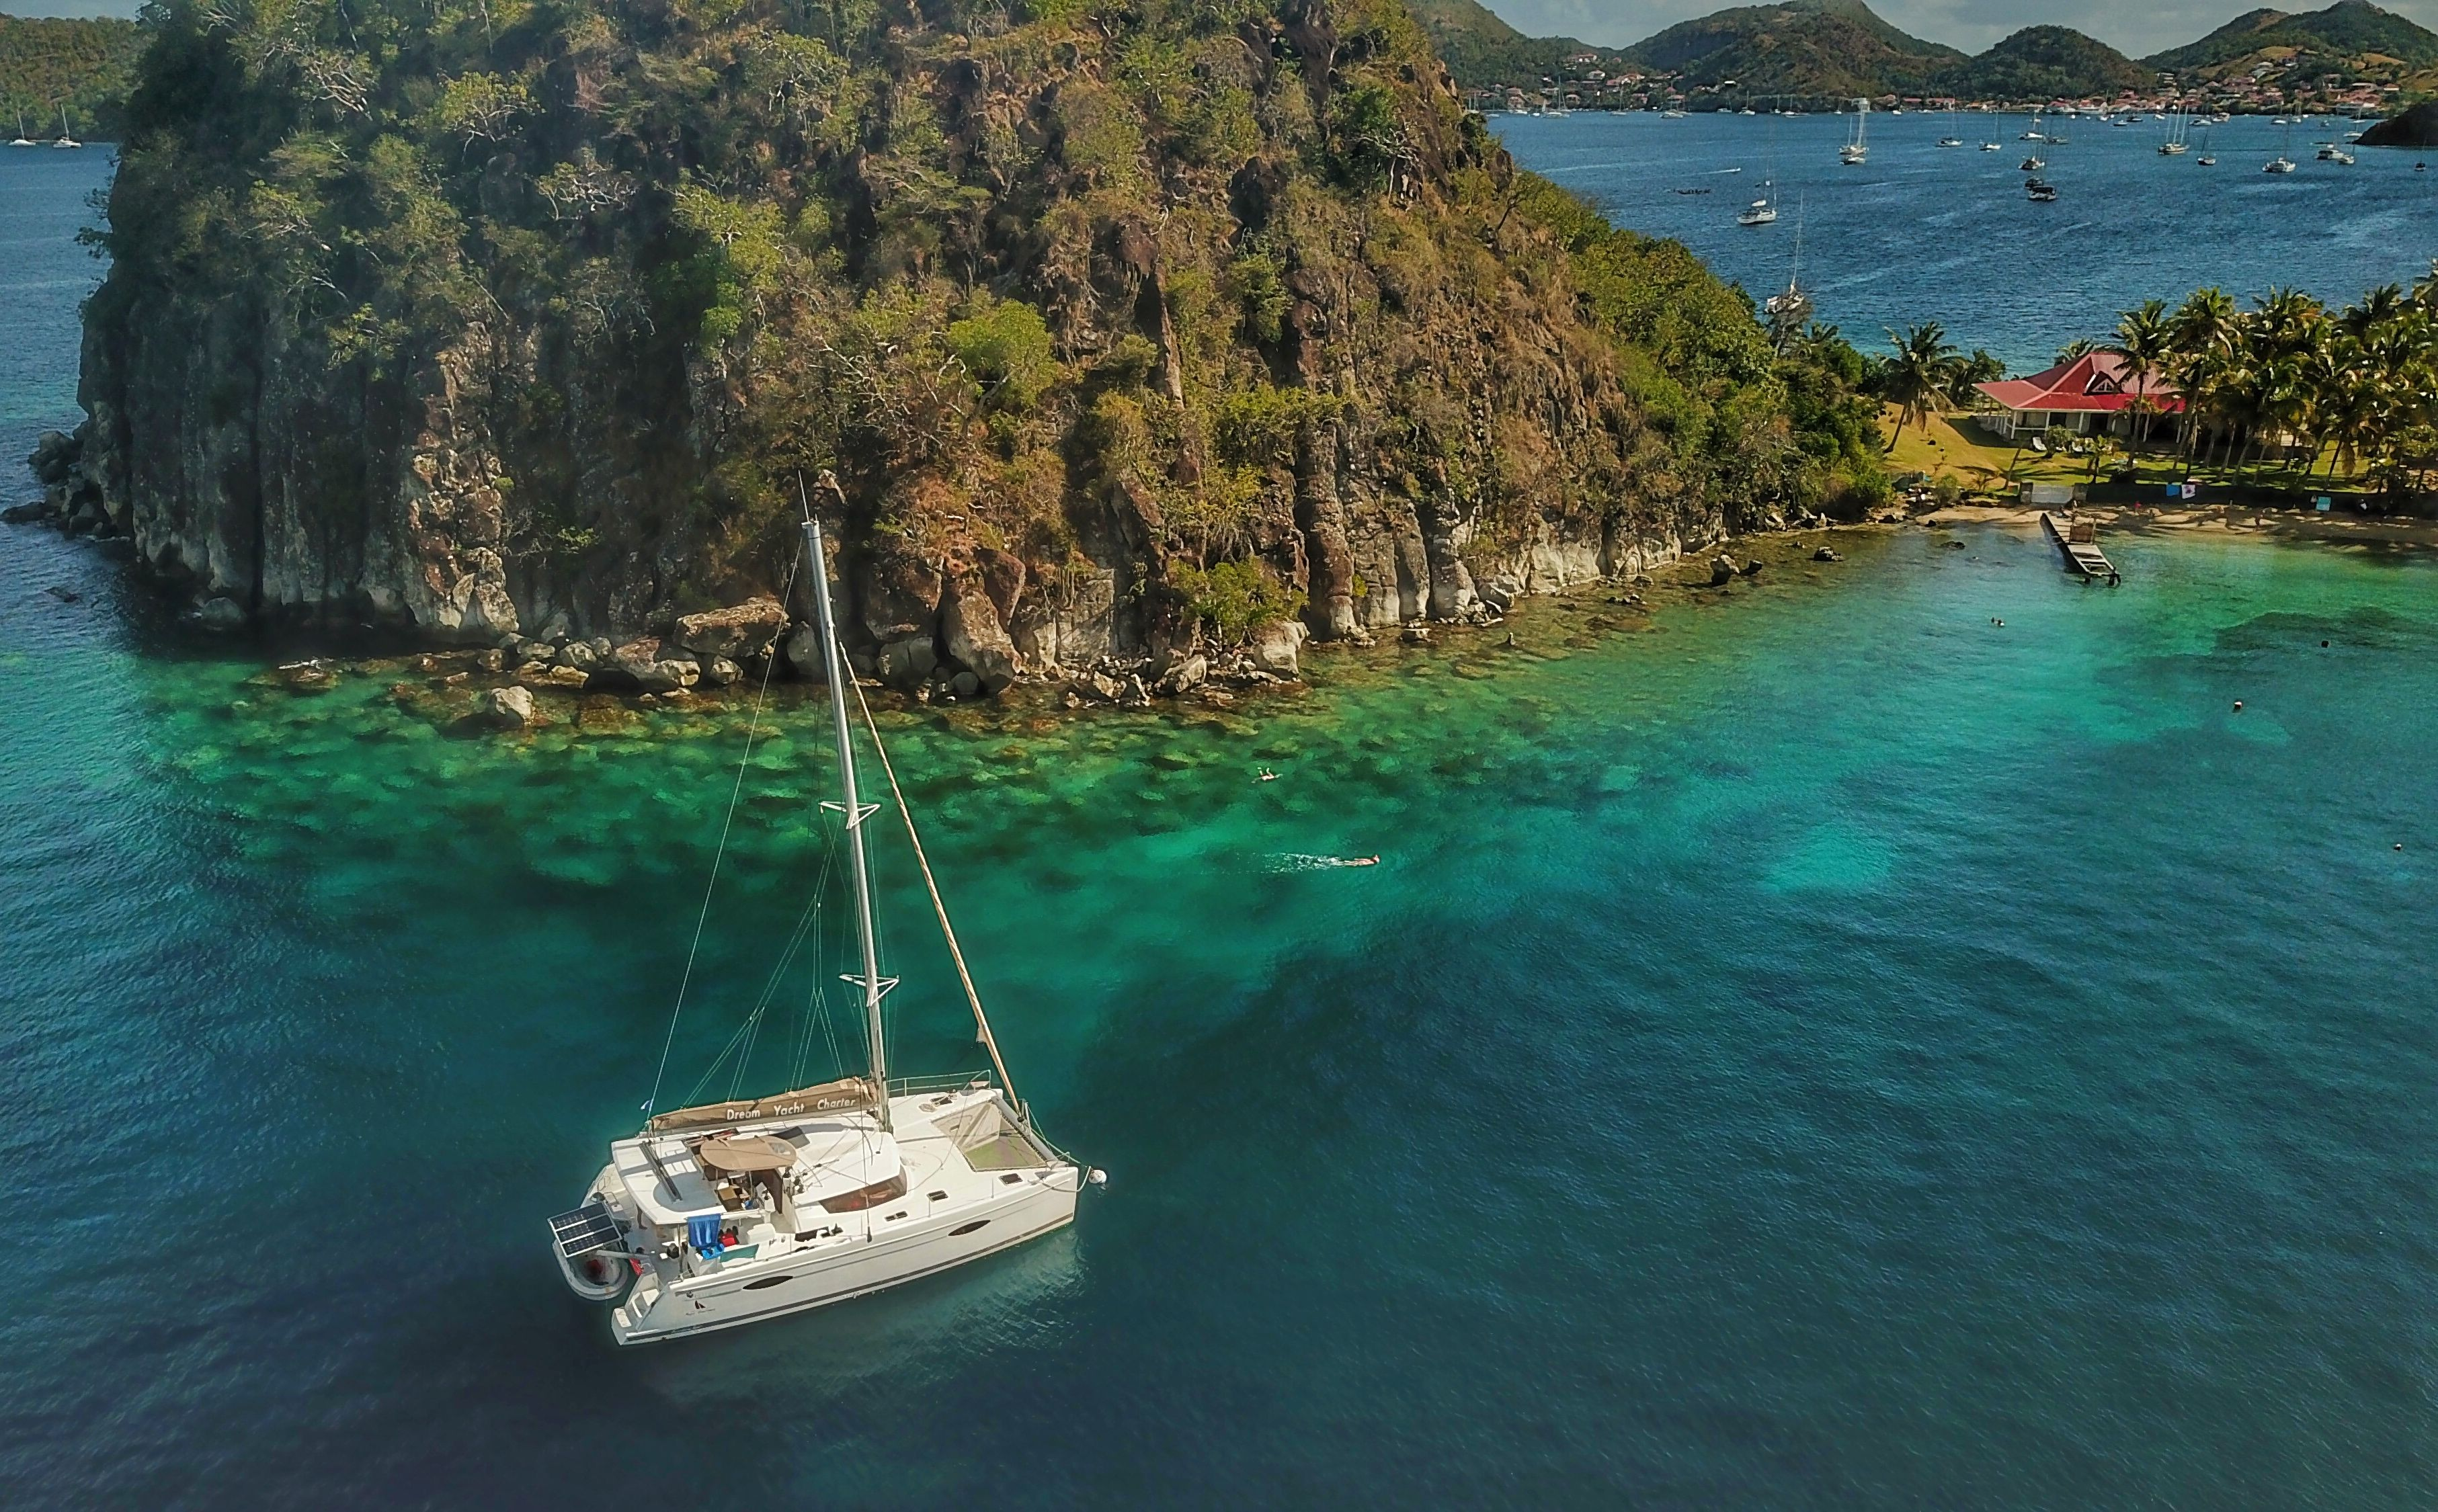 Catamaran sailing in the caribbean sailing sailboat